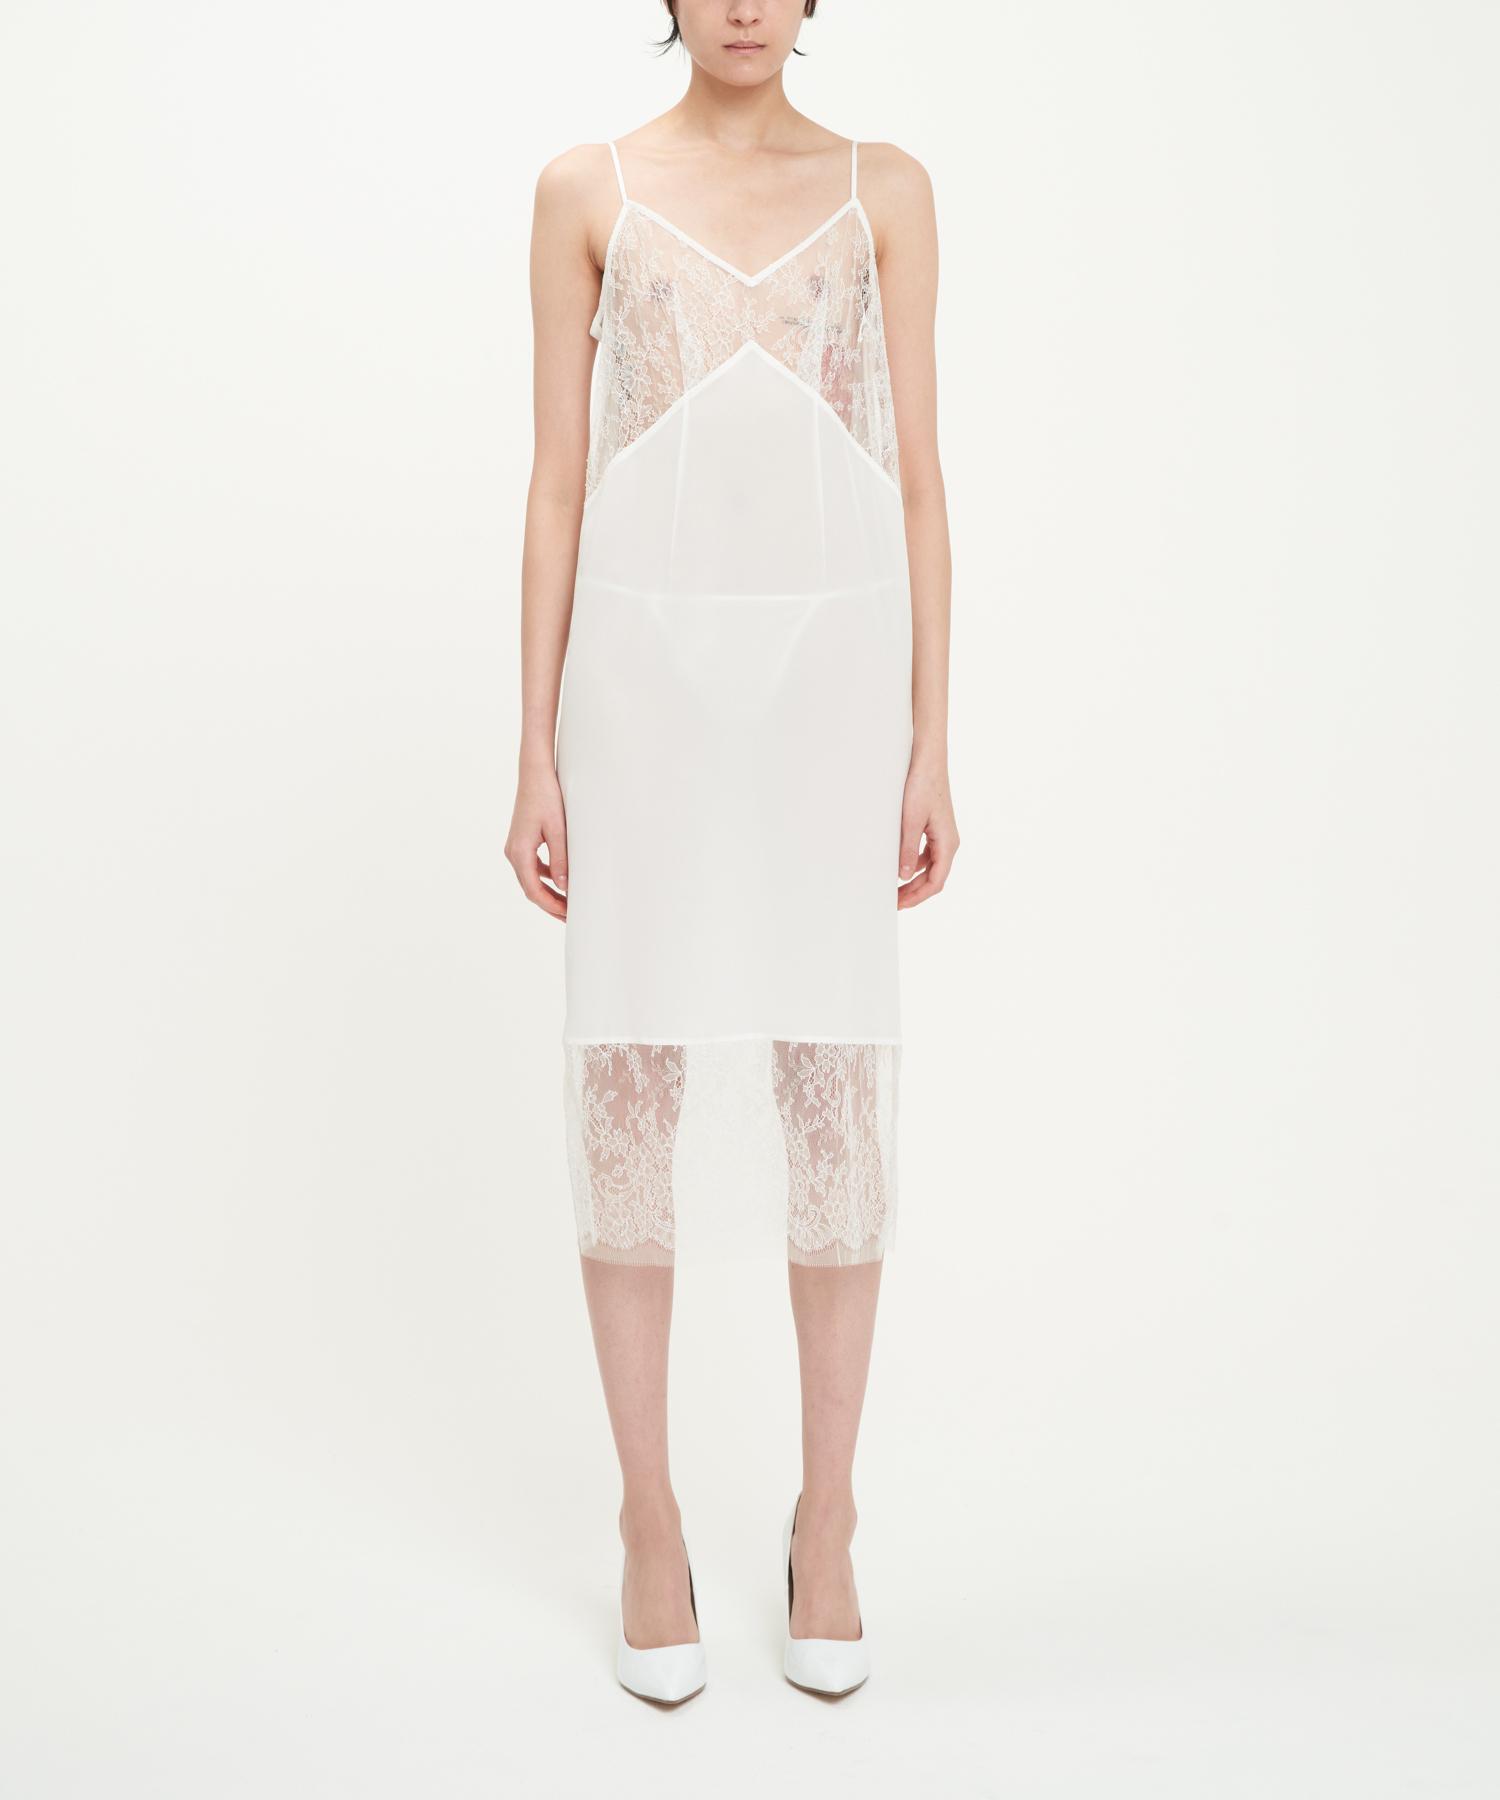 White River Lace Slip Dress